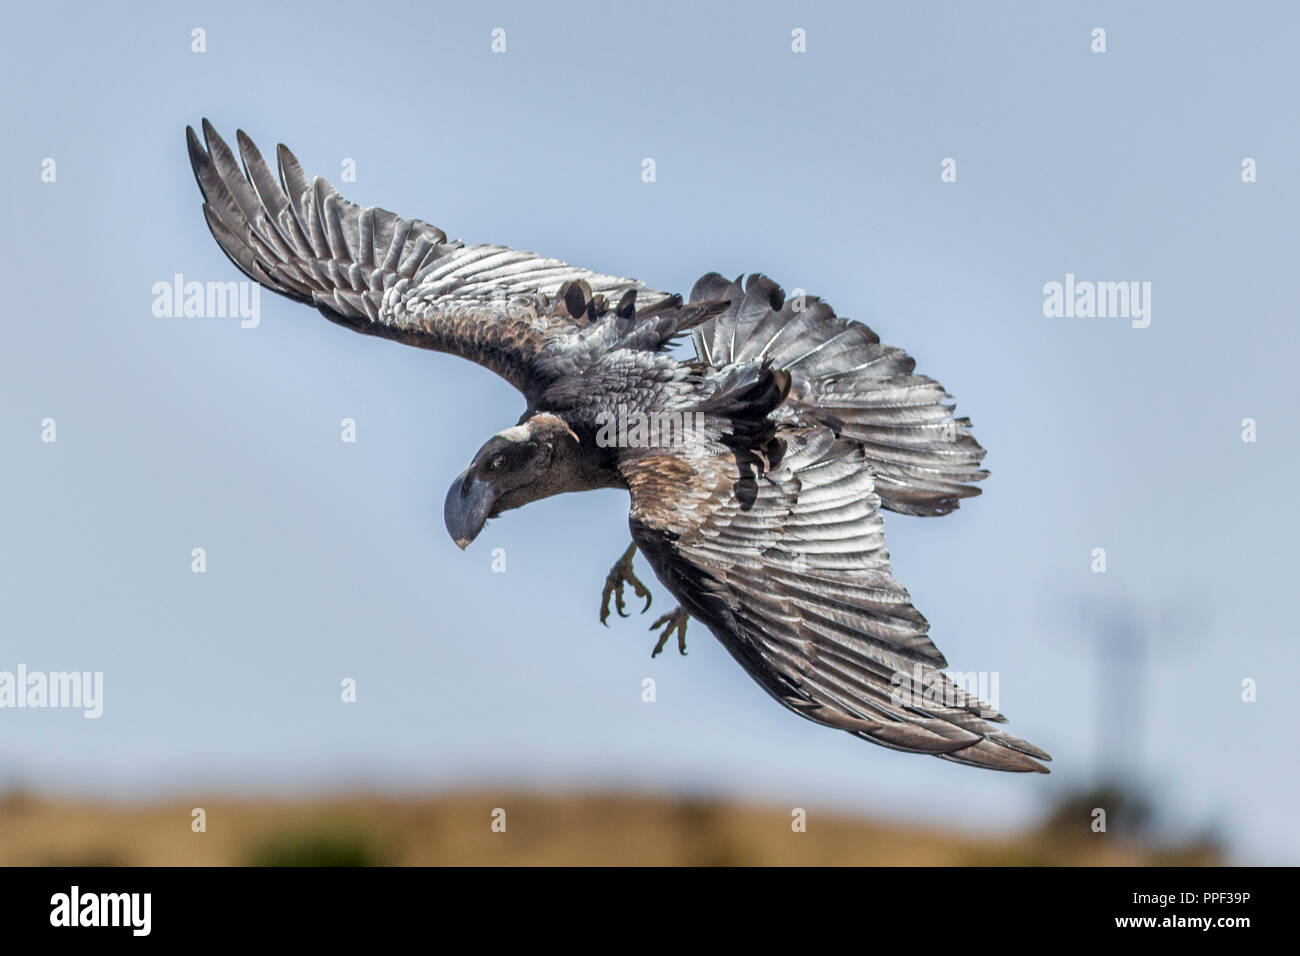 Thick-billed raven, Corvus crassirostris, a corvid  Simiens National Park, Ethiopia - Stock Image